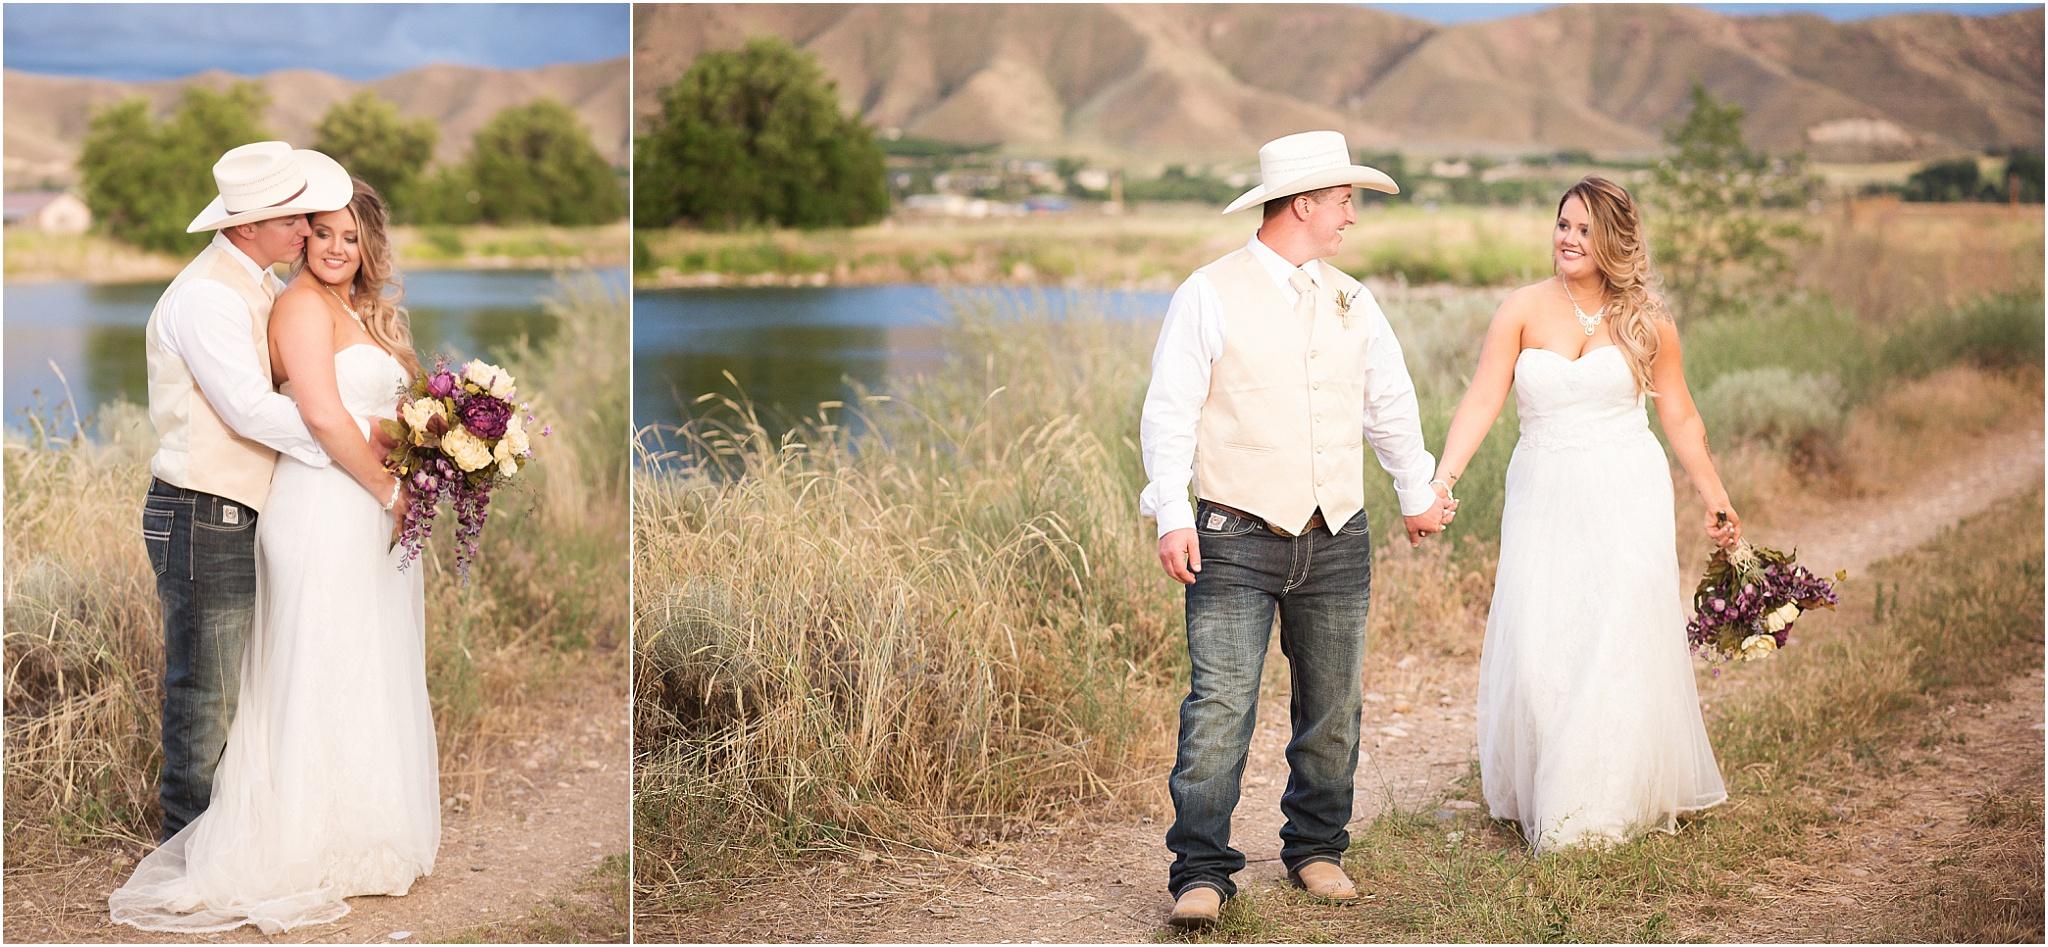 Wedding Photography_Emmett Idaho_Boise Idaho_Leah Southwick Photography_0049.jpg